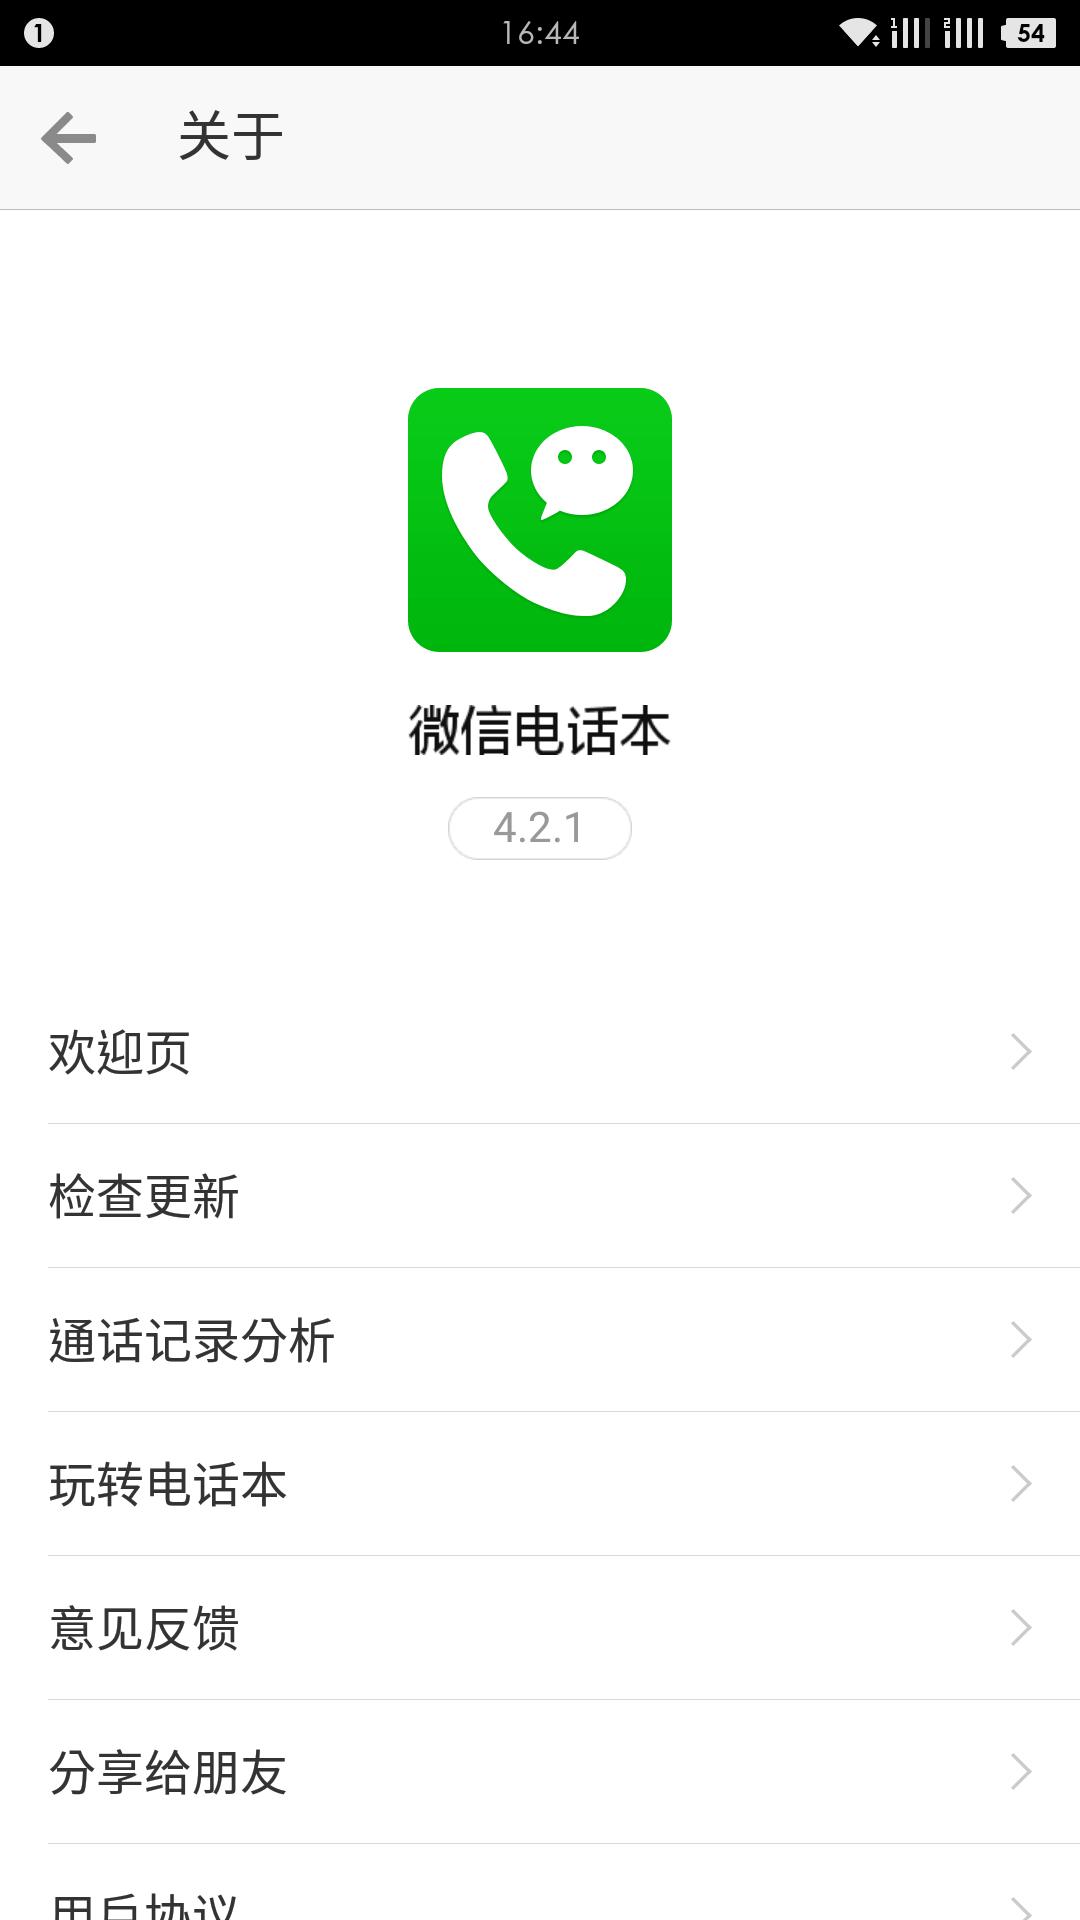 Screenshot_2015-11-22-16-44-51.png